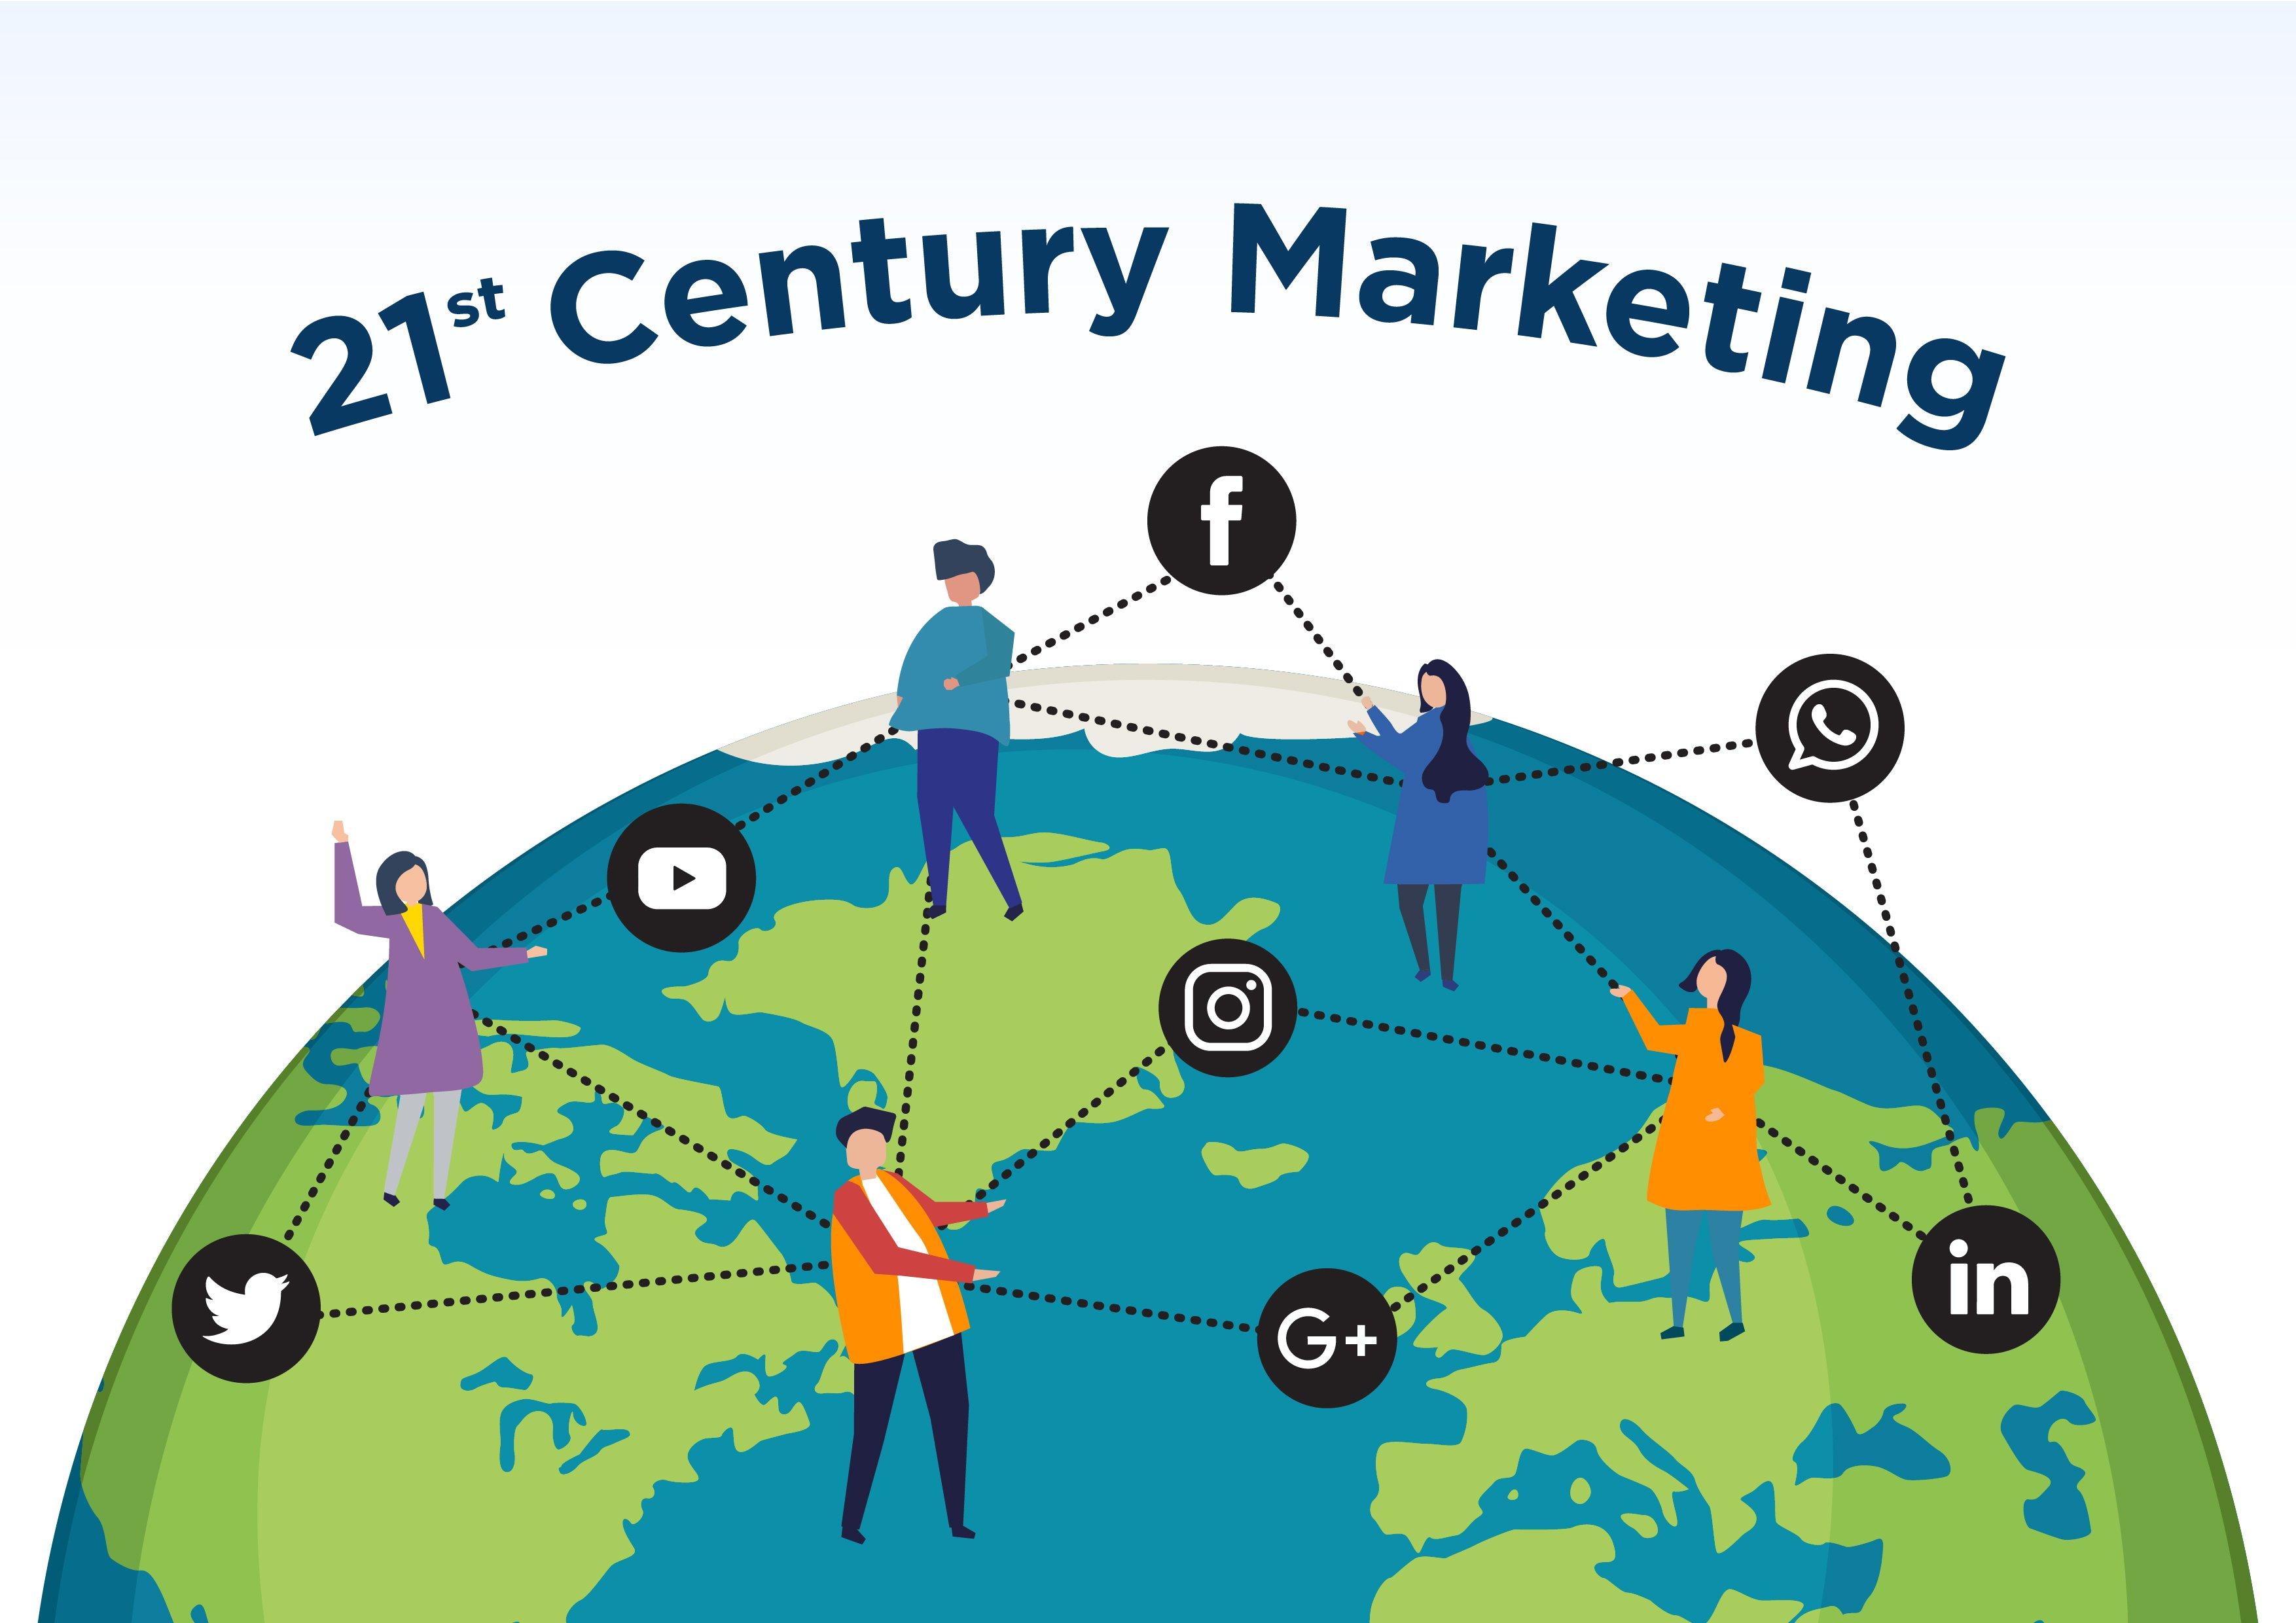 21st century marketing